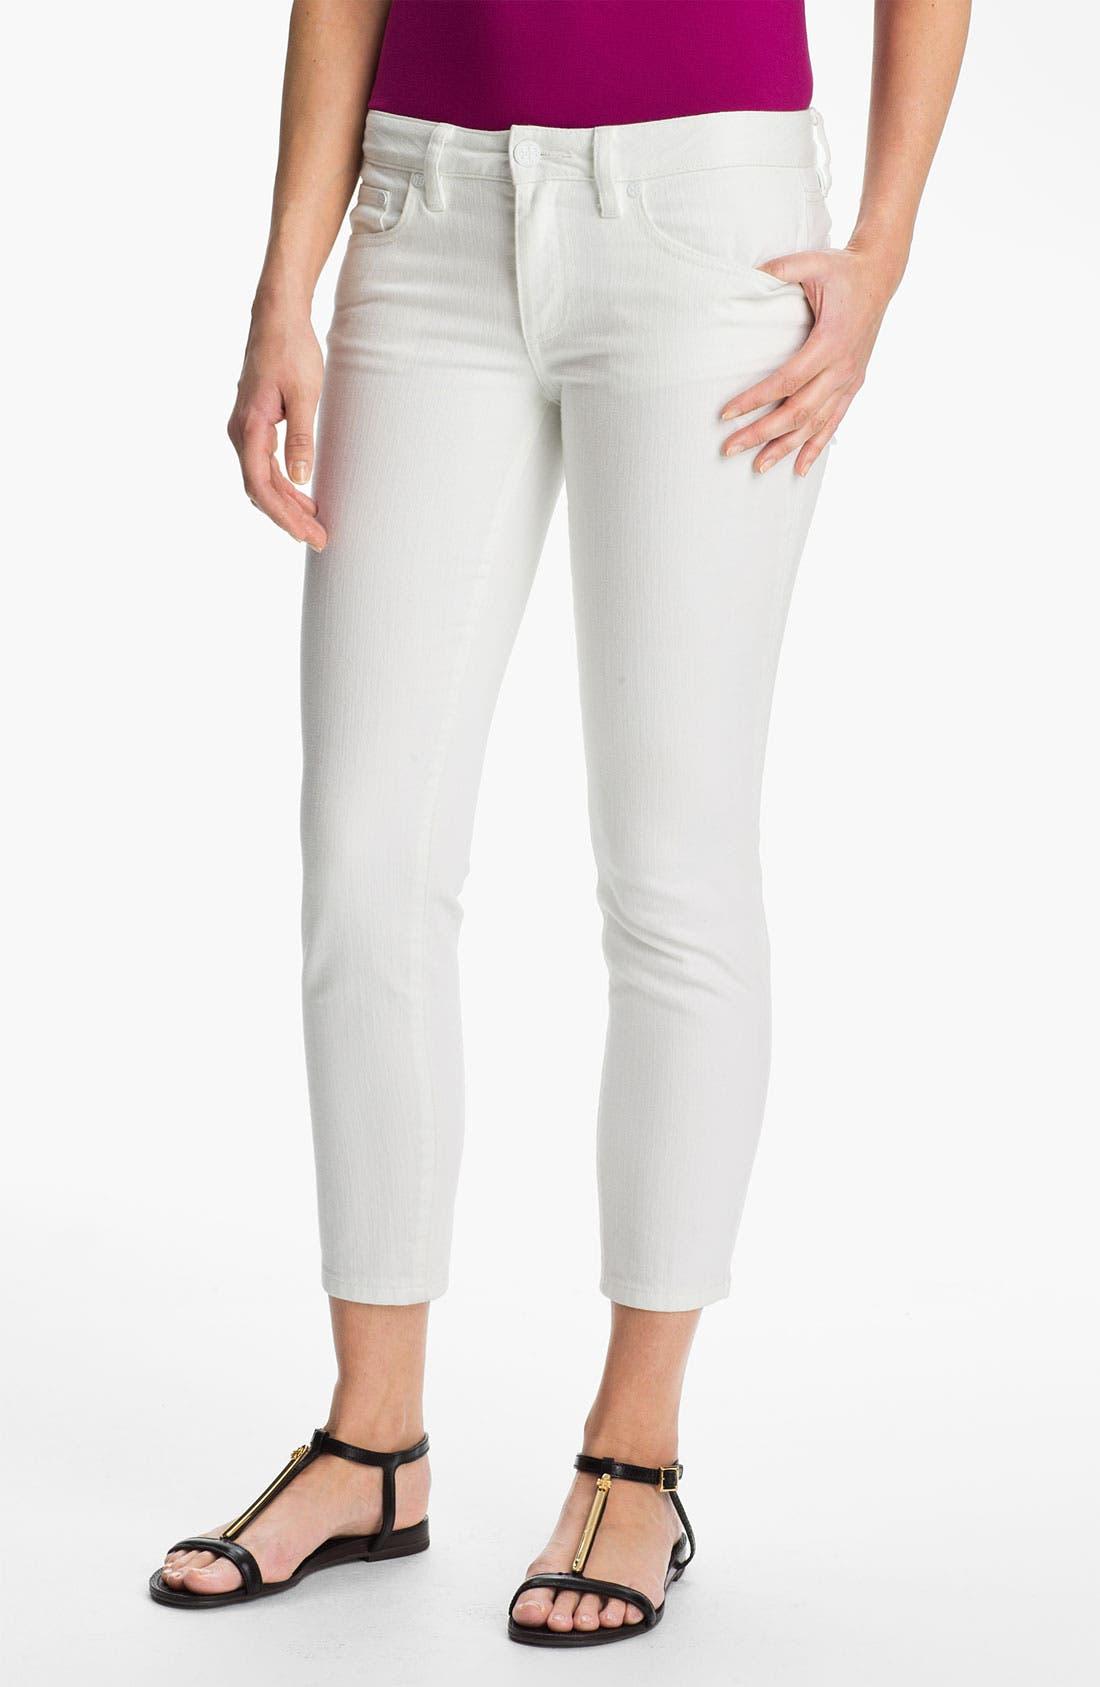 Main Image - Tory Burch 'Alexa' Crop Skinny Stretch Jeans (Stone)